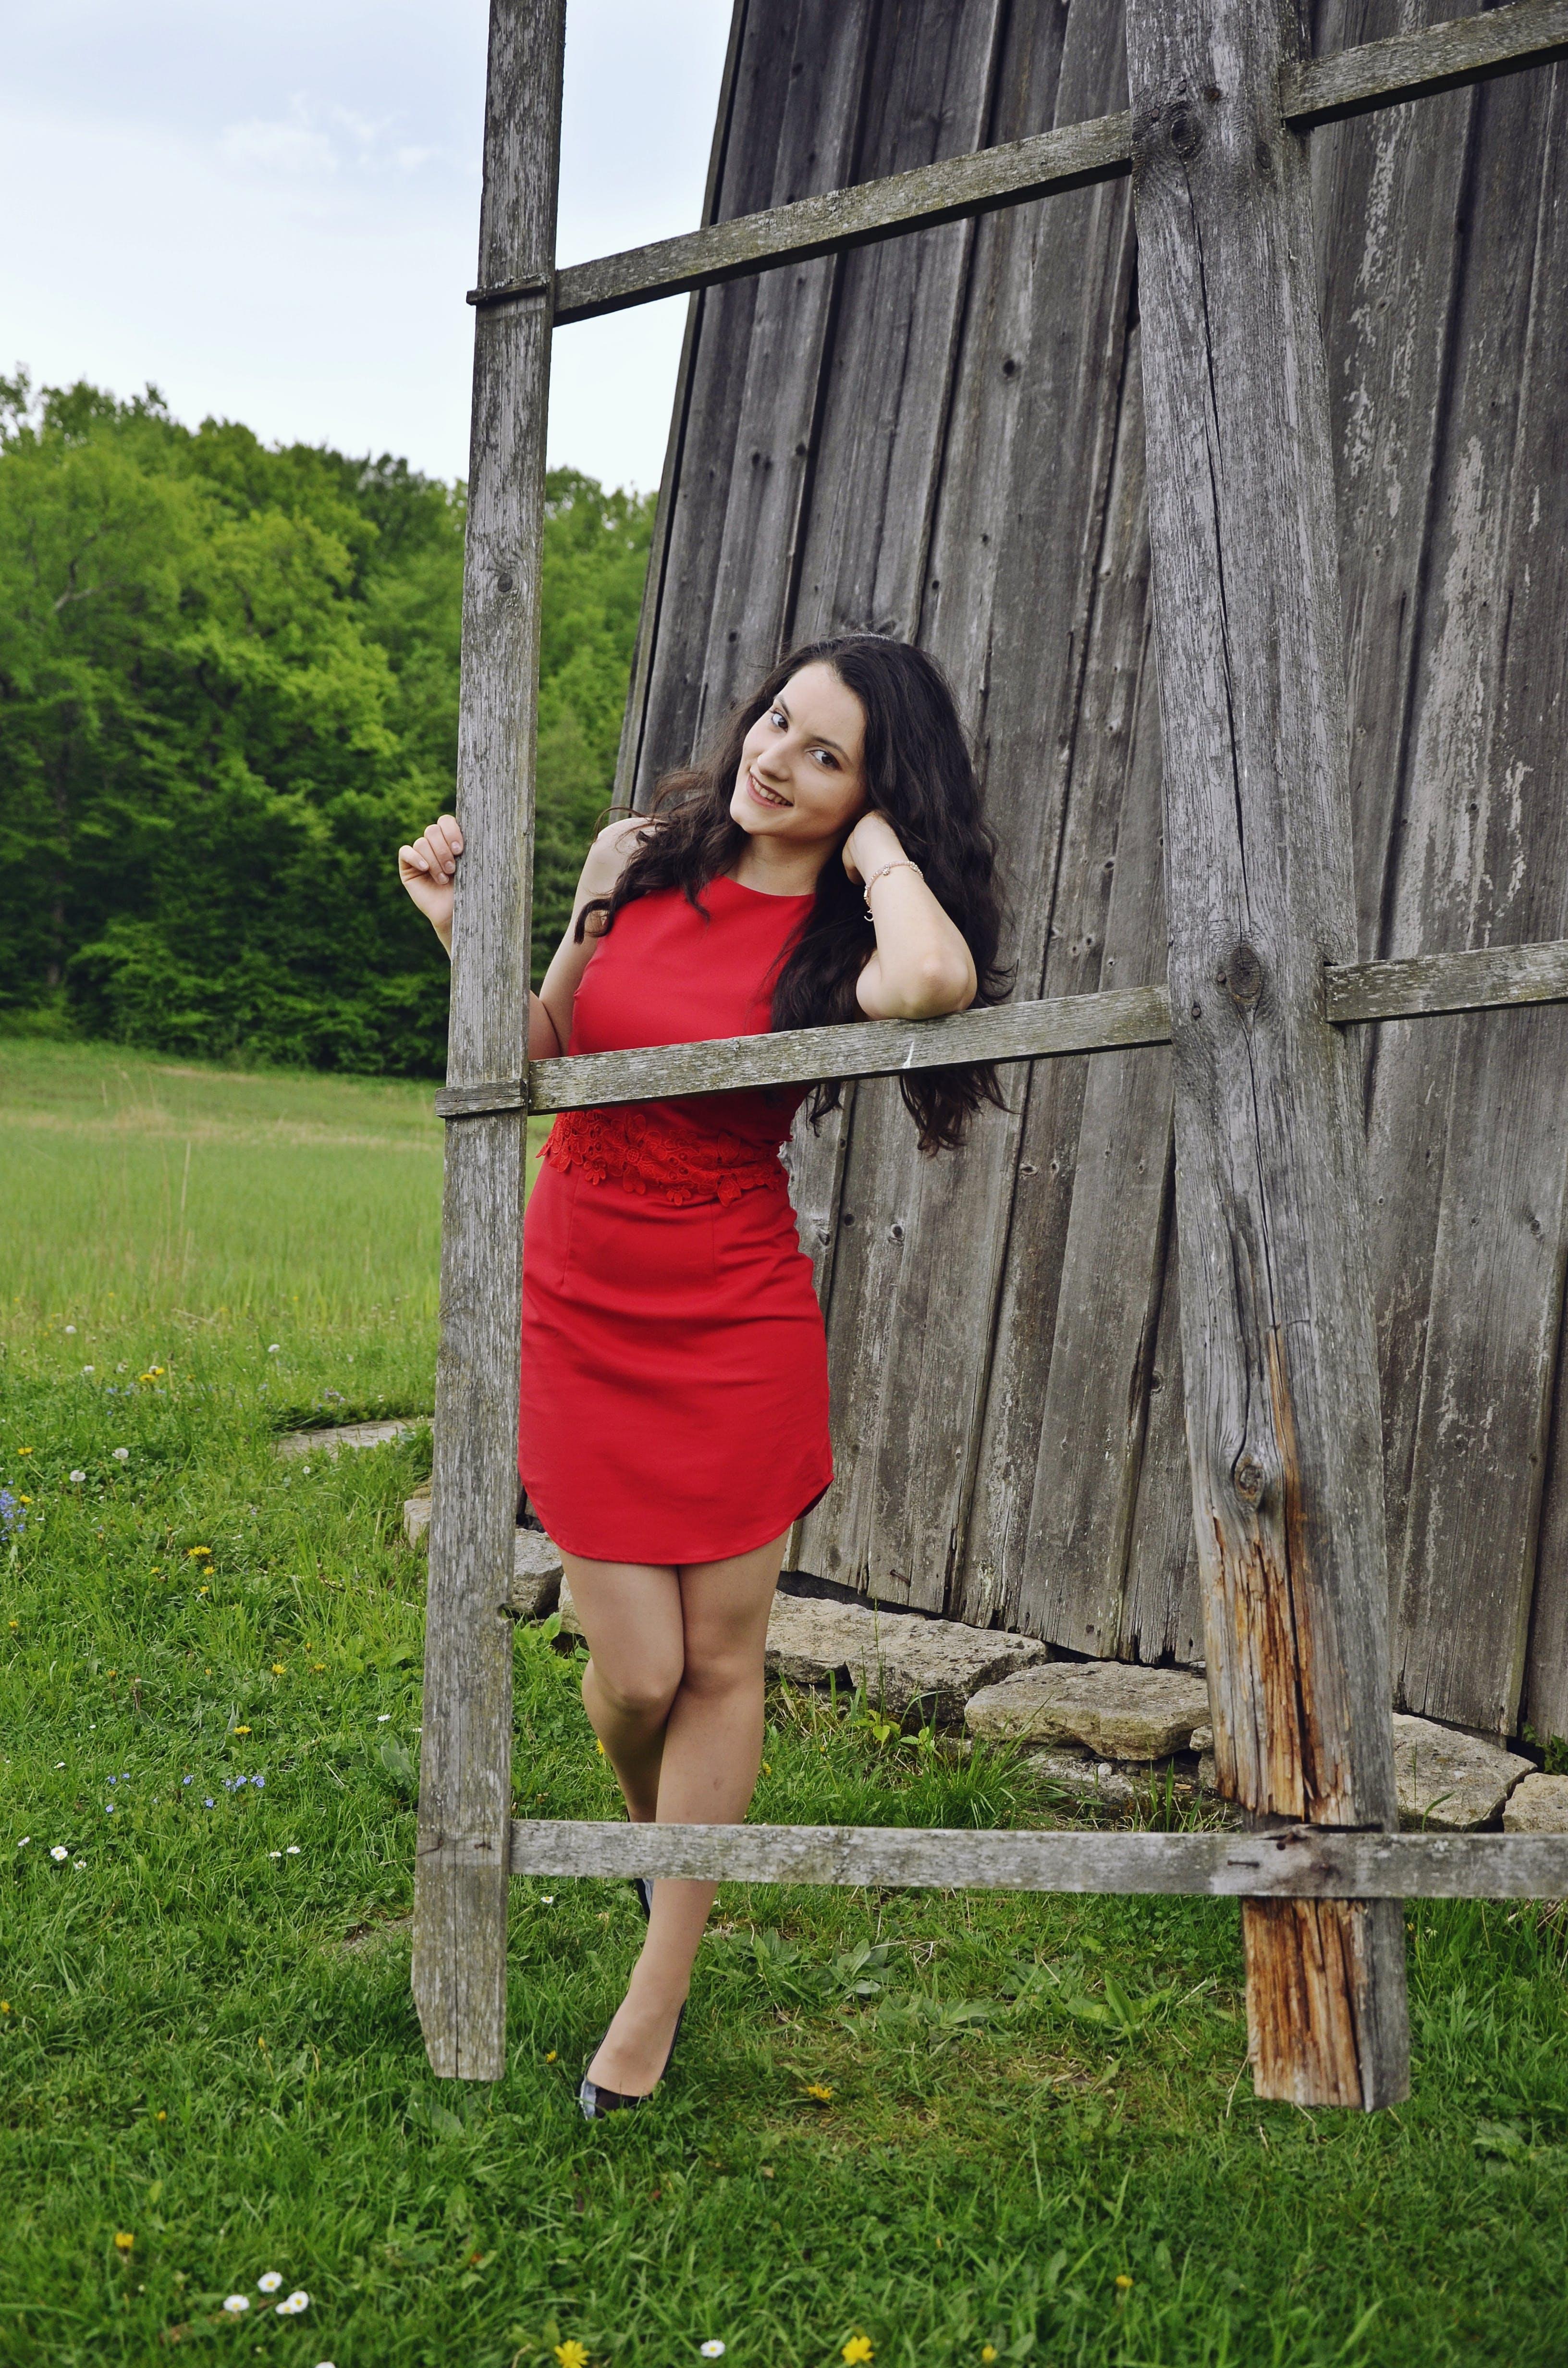 Woman in Red Dress Standing Beside Windmill